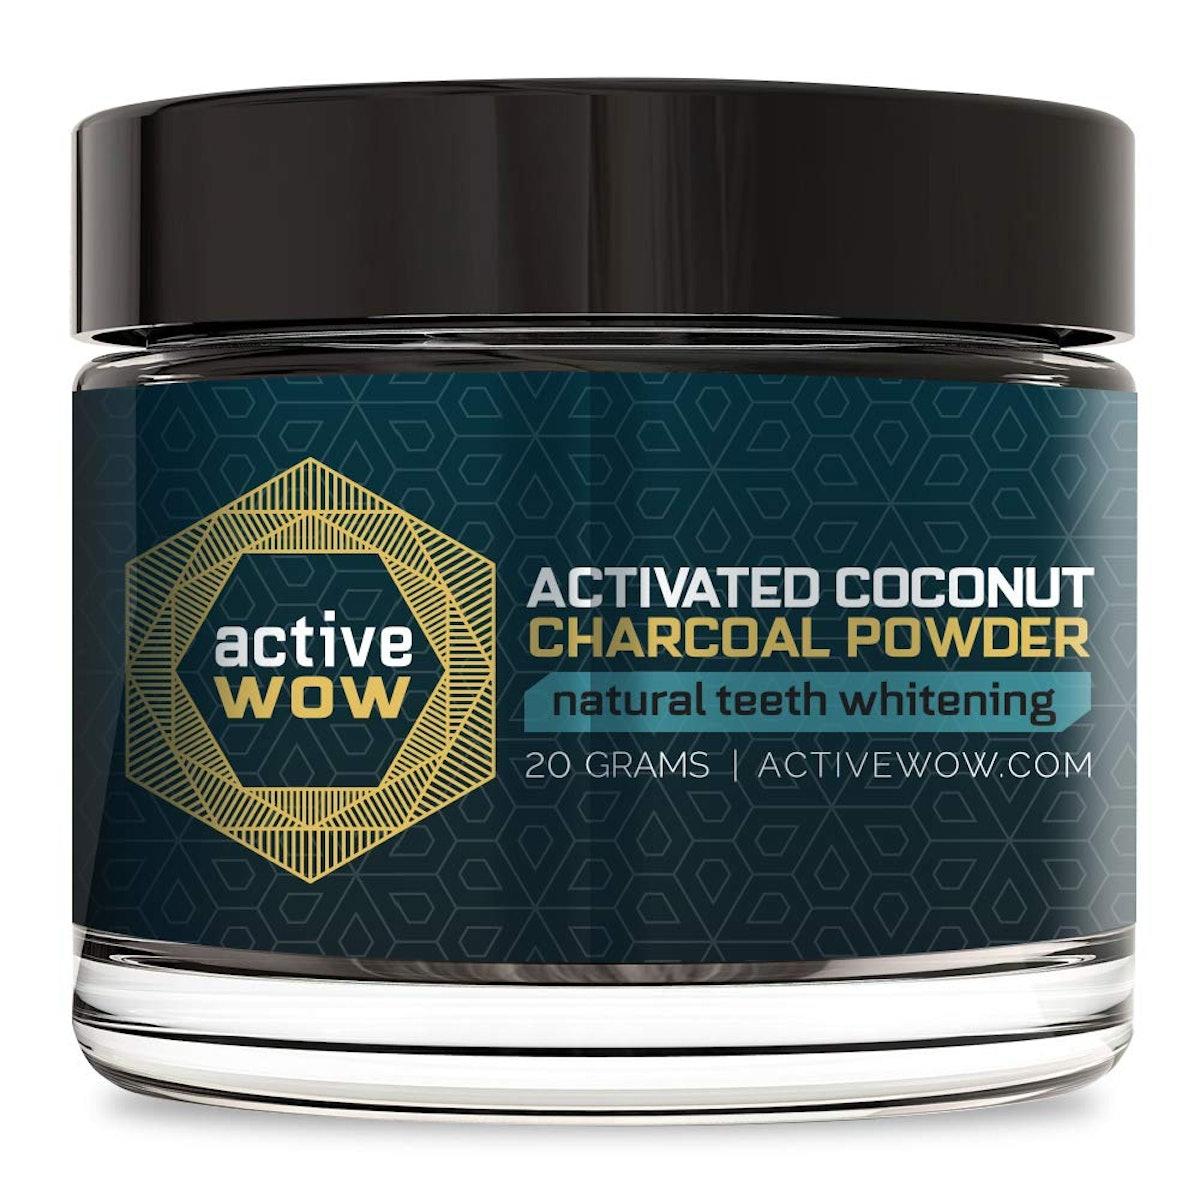 Active Wow Teeth Whitening Powder